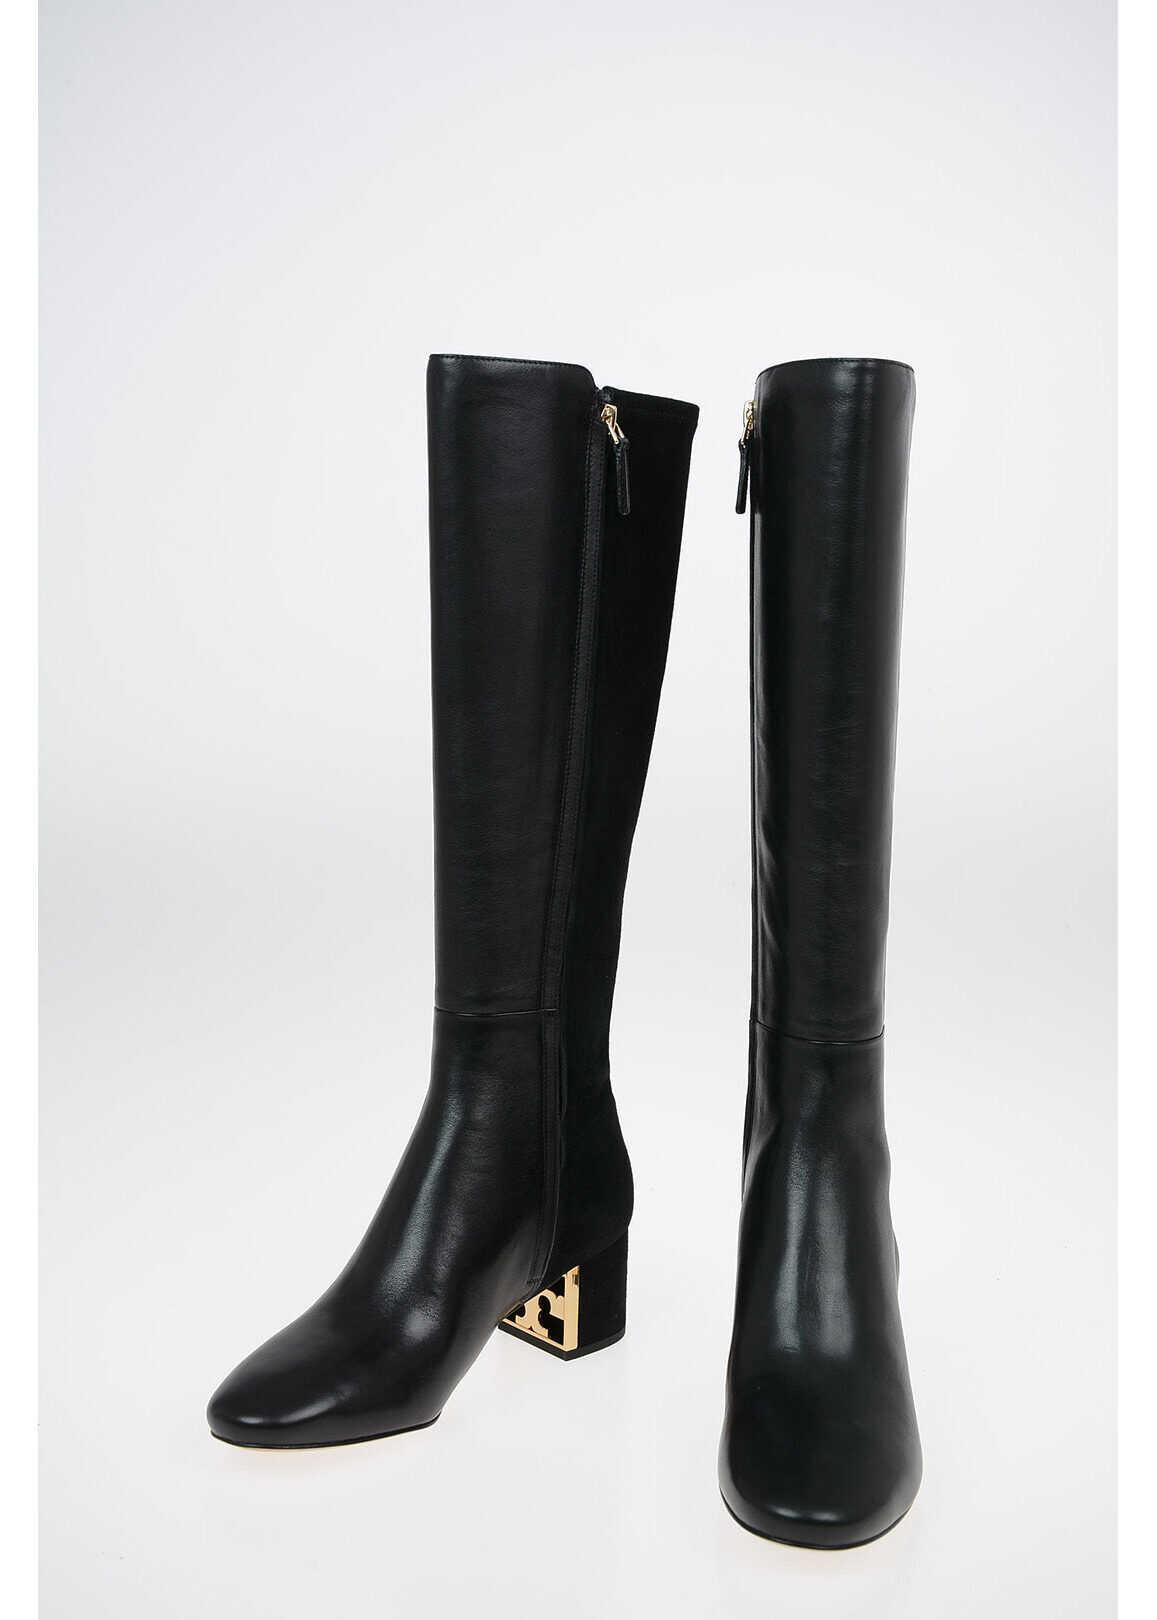 Tory Burch 5.5cm Suede leather GIGI Boots BLACK imagine b-mall.ro